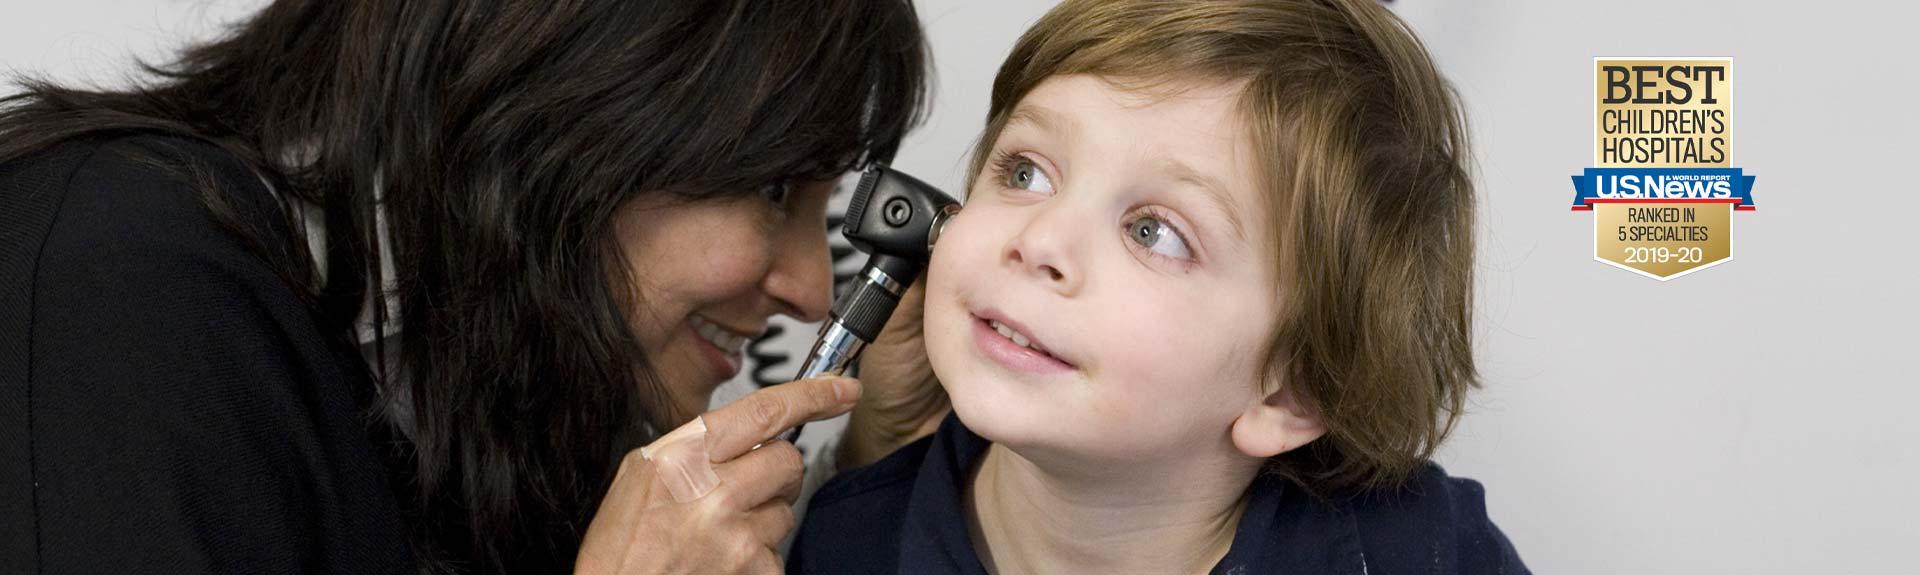 Children's Hospital - Pediatrics NYC | Mount Sinai - New York